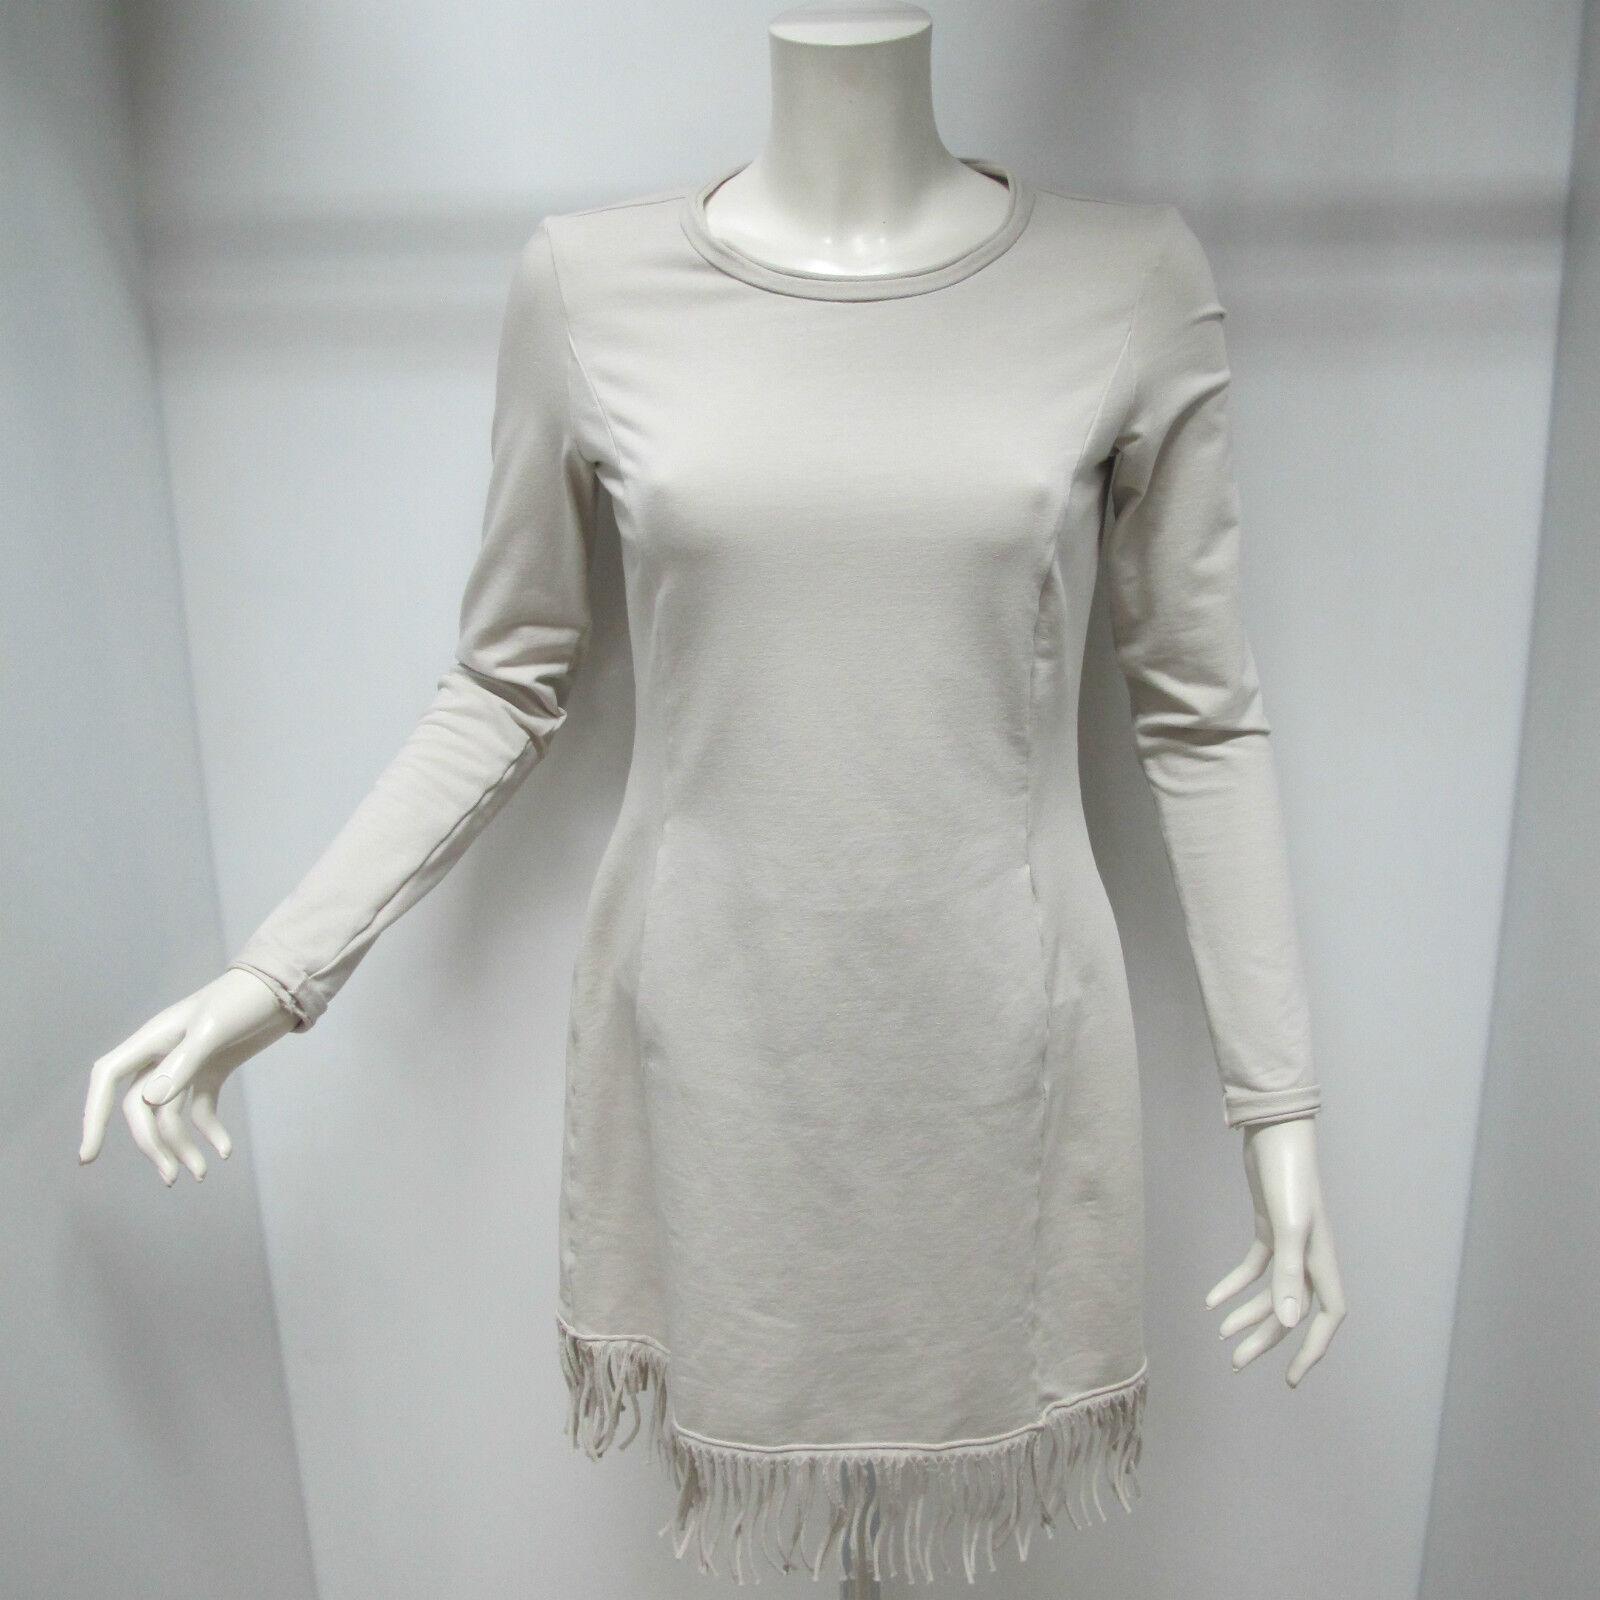 EUROPEAN CULTURE women'S dress with sleeves mod.10X0 BEIGE size S winter 2015